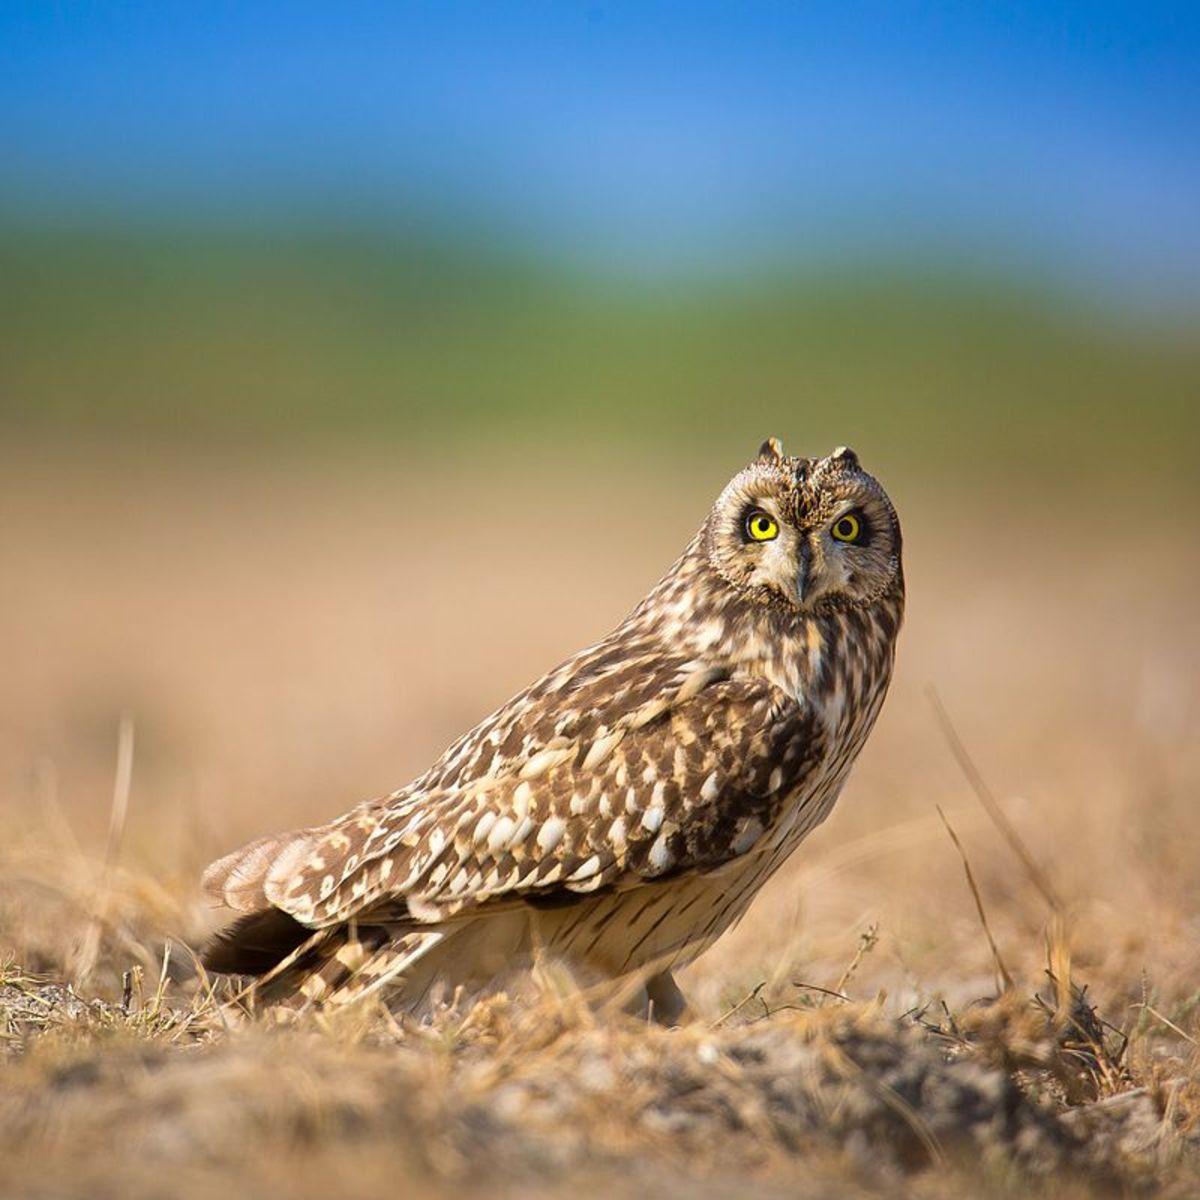 Birding Trip Report: Short-Eared Owl at Kenilworth,Warwickshire 21/10/18